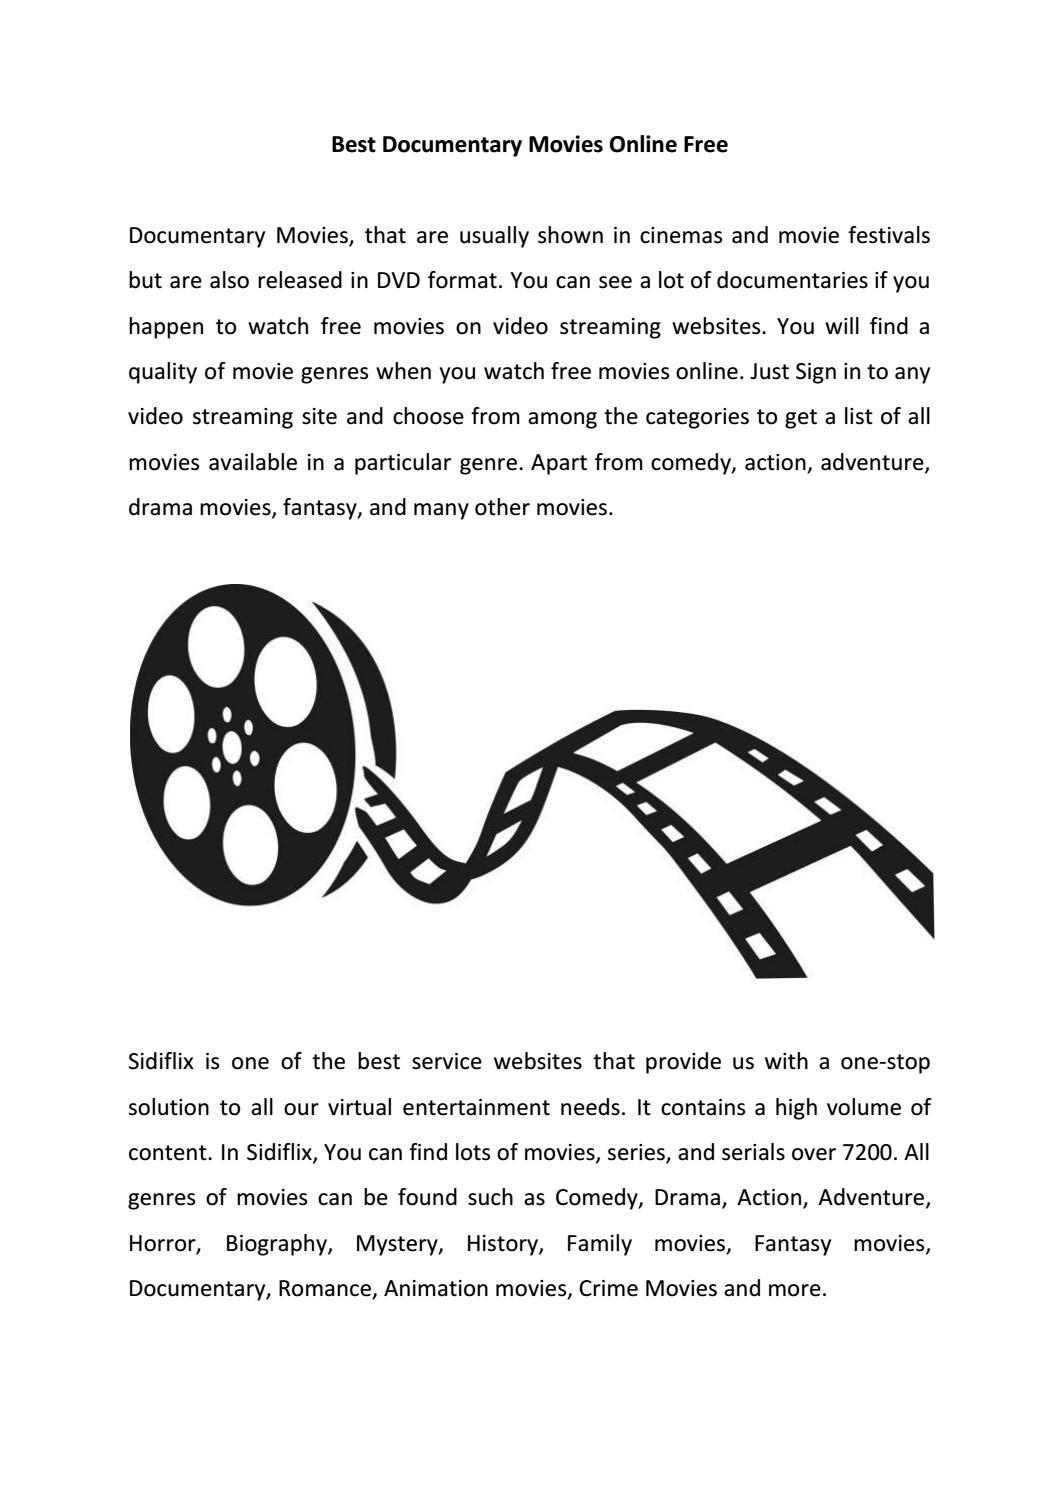 Best Documentary Movies Online Free by markgordon0808 - issuu